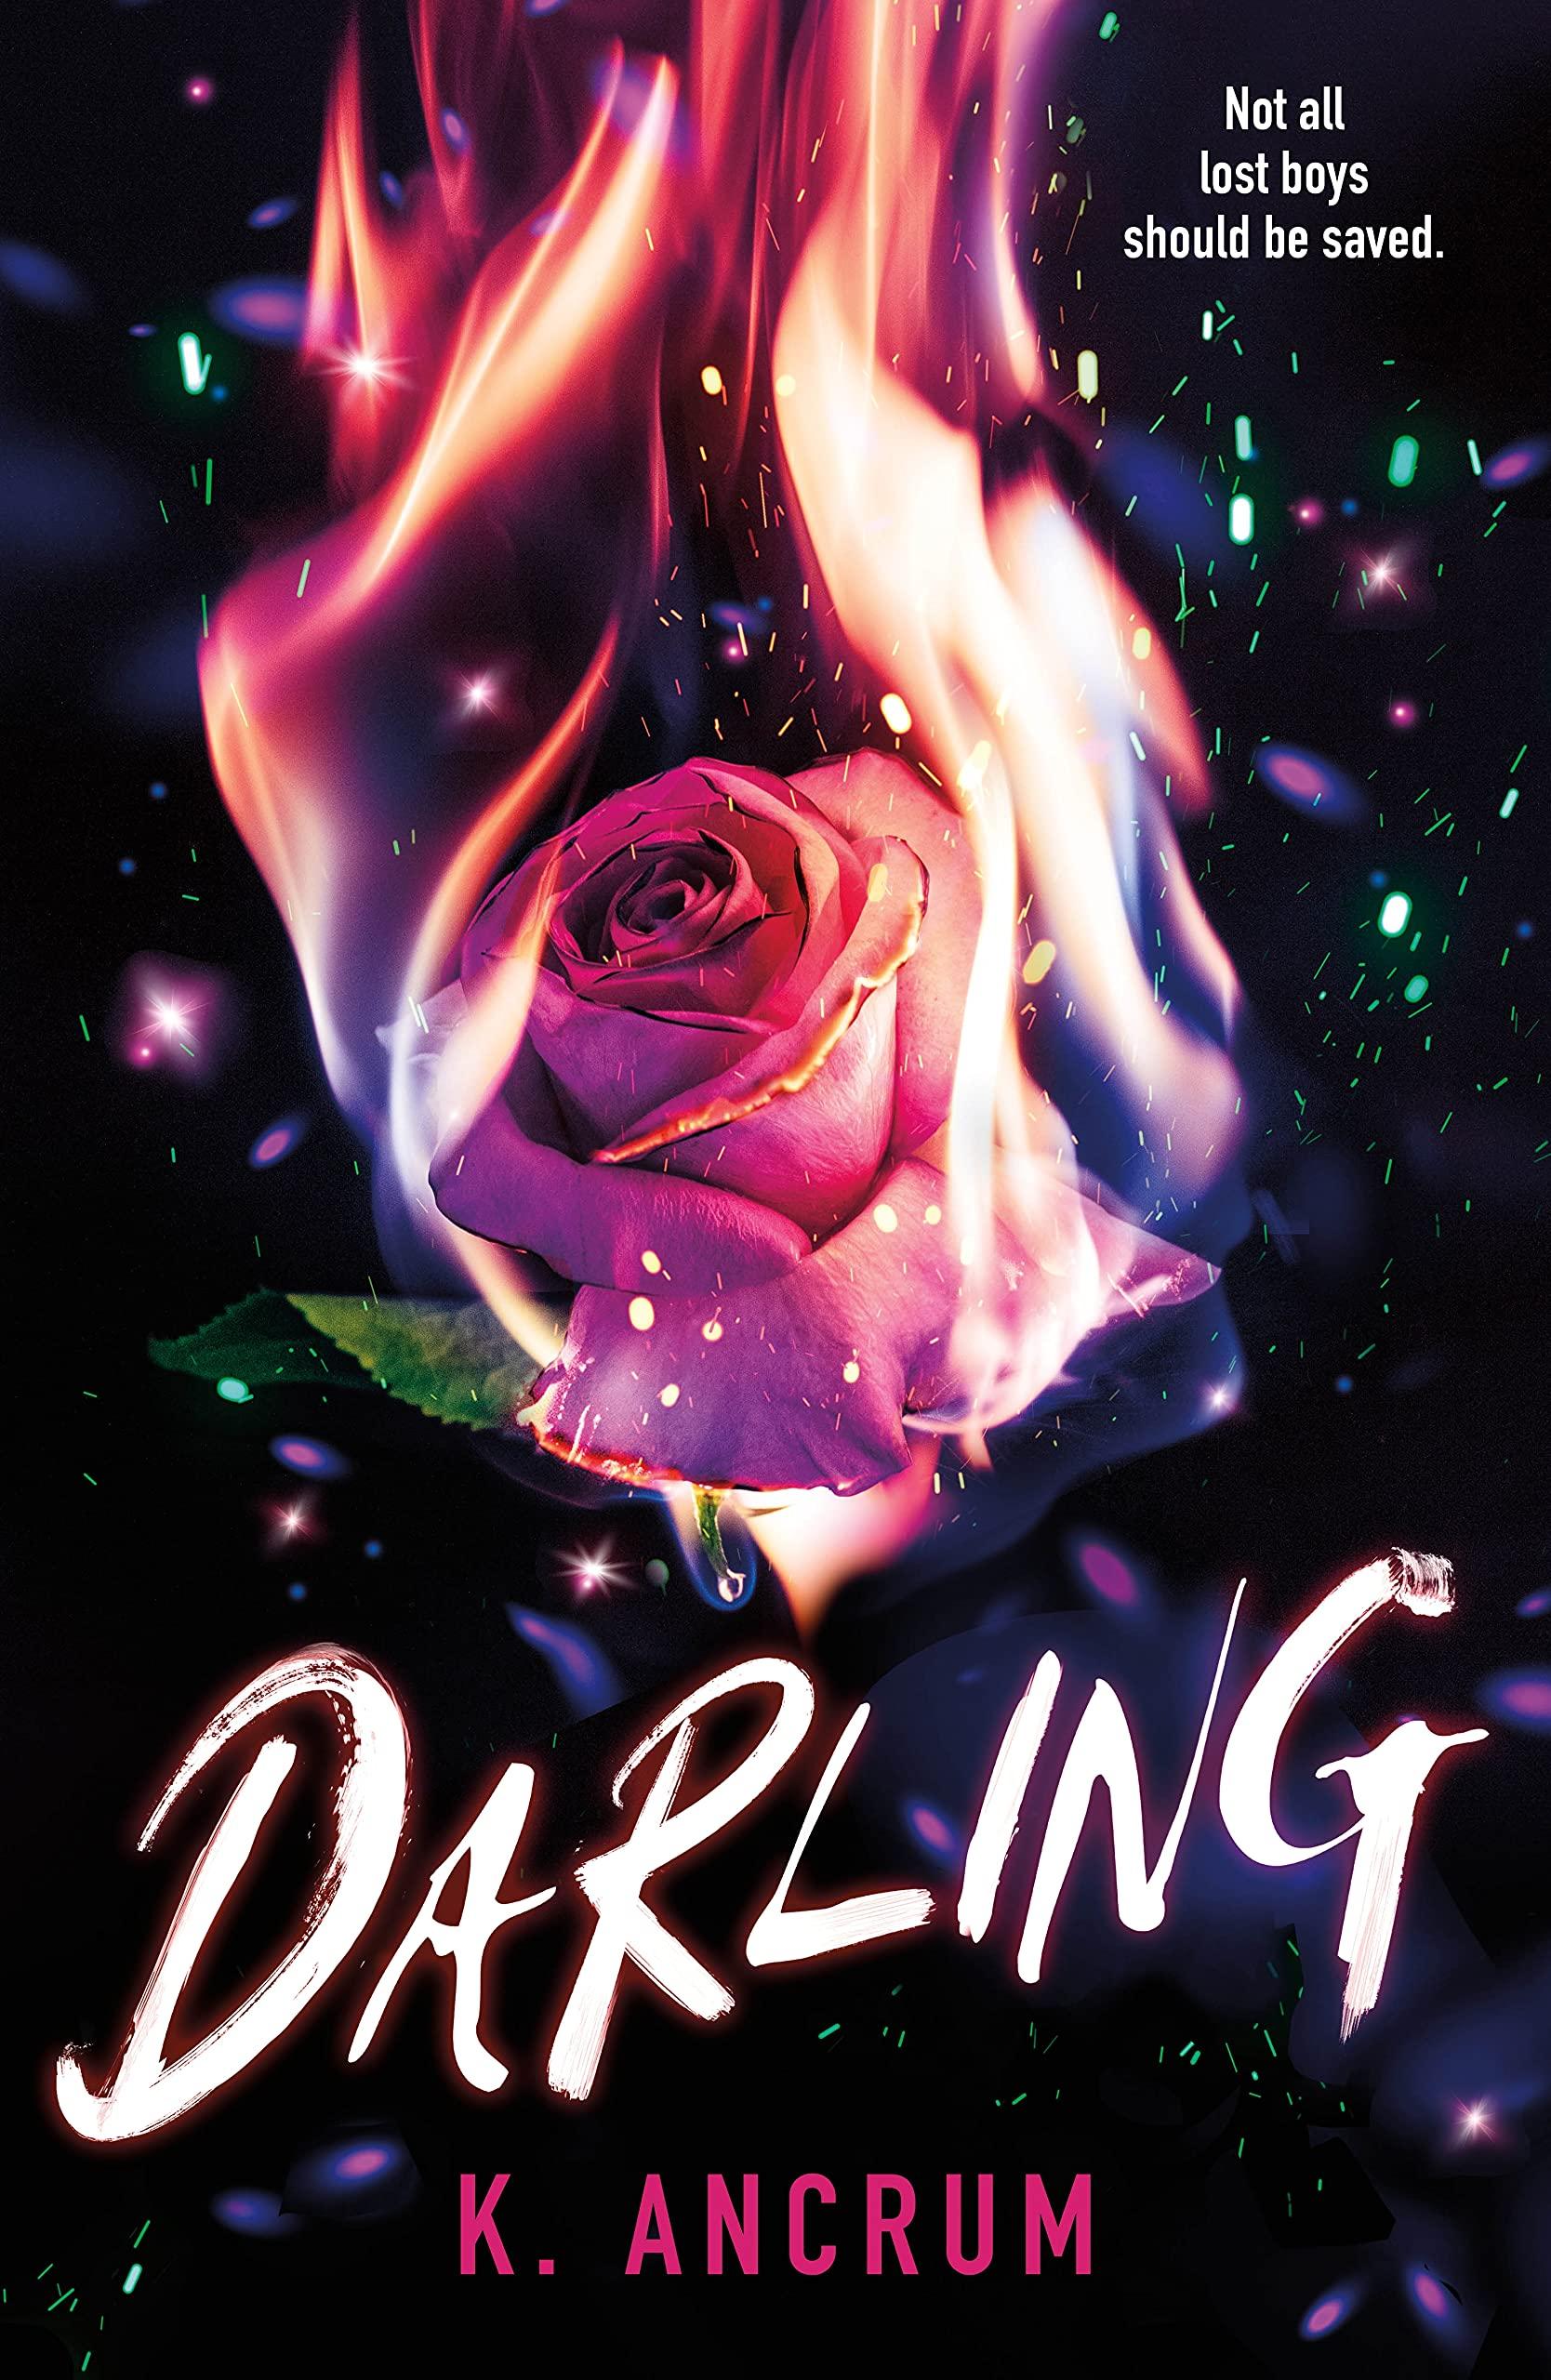 Amazon.com: Darling: 9781250265265: Ancrum, K.: Books